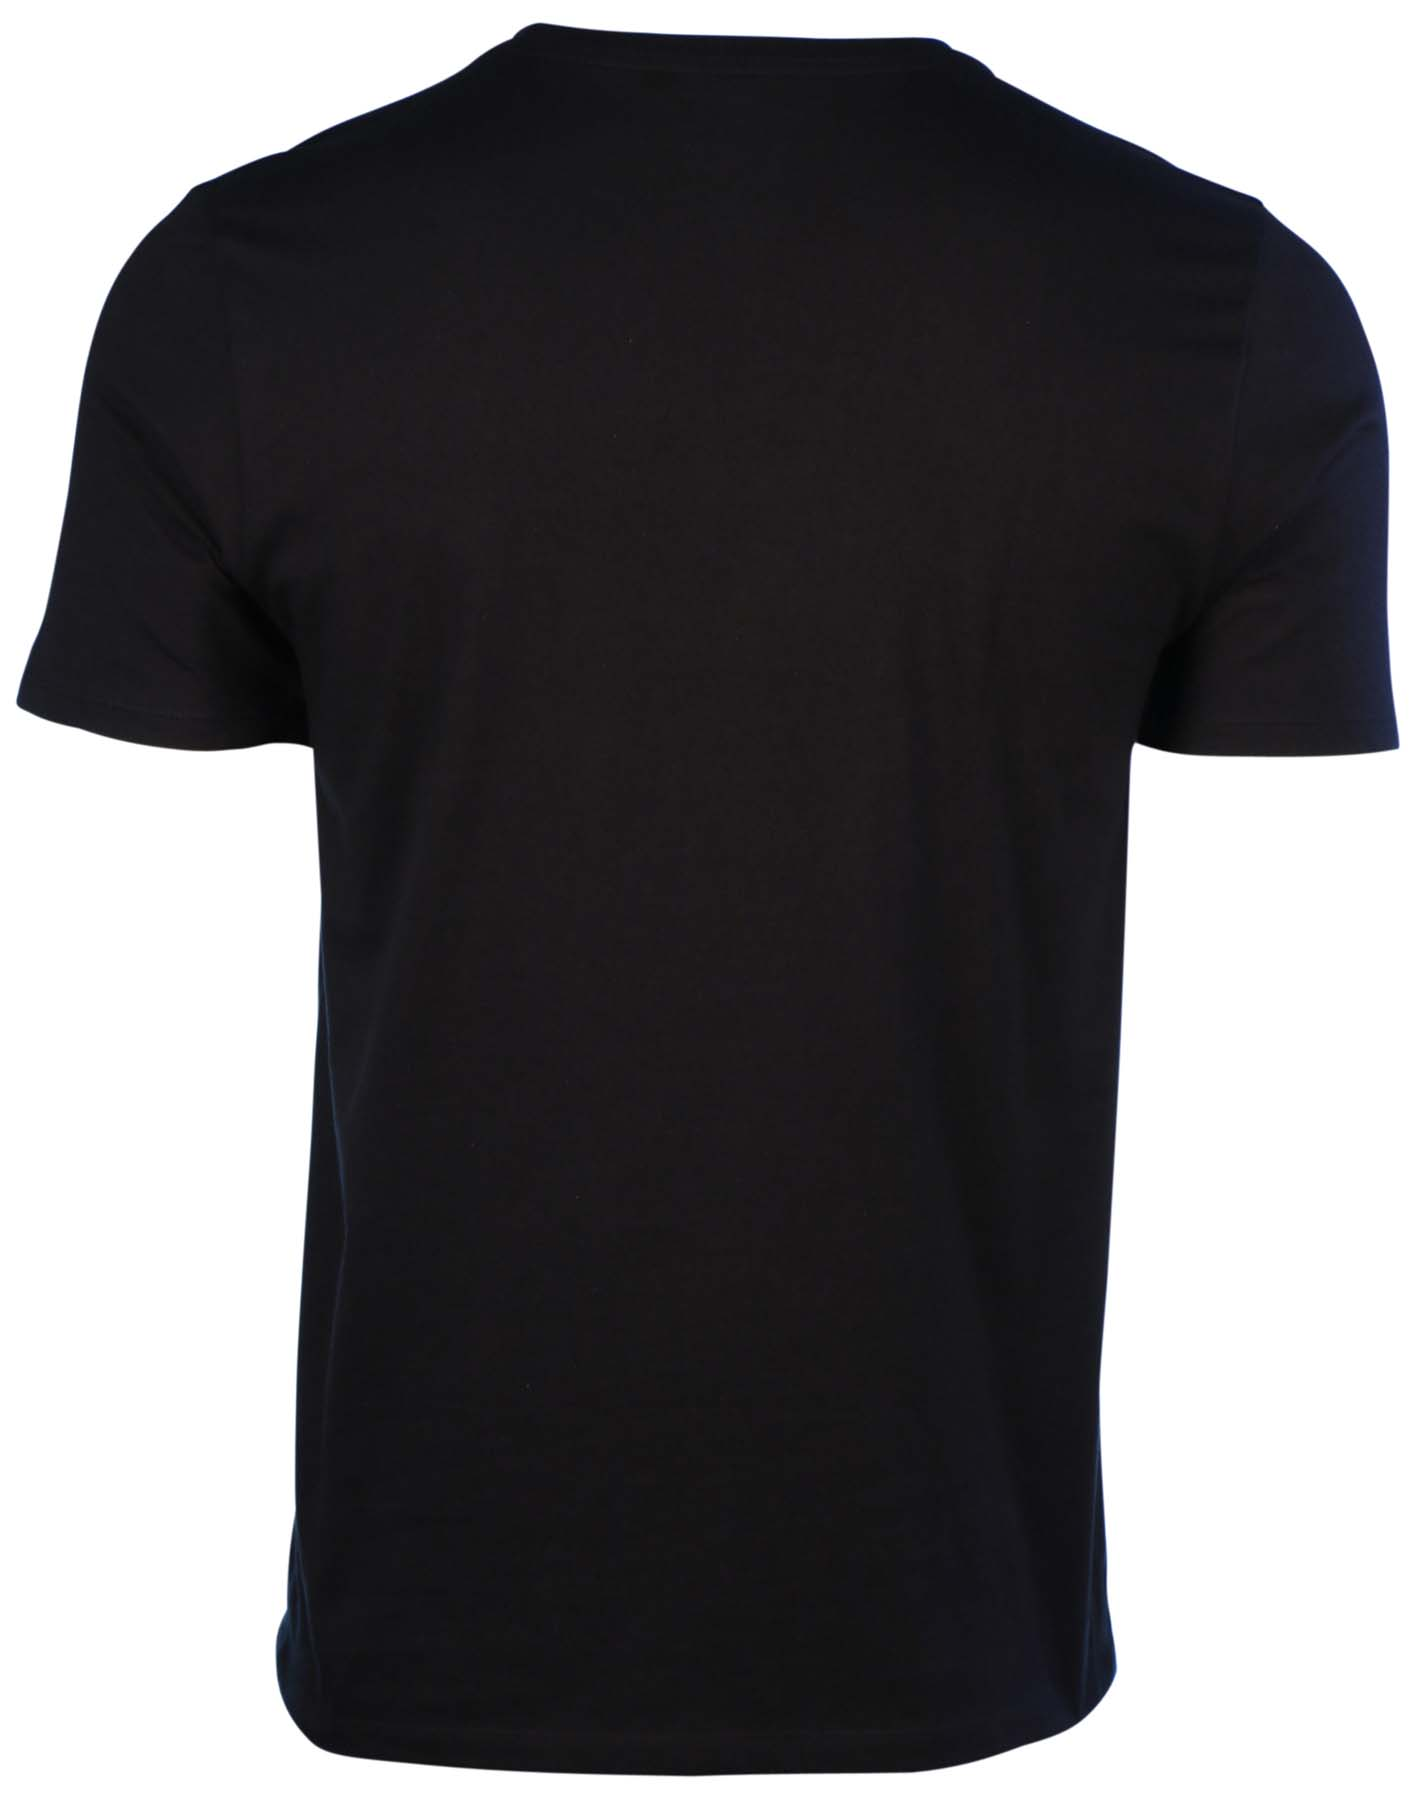 Beast Nike Shirt Unleash